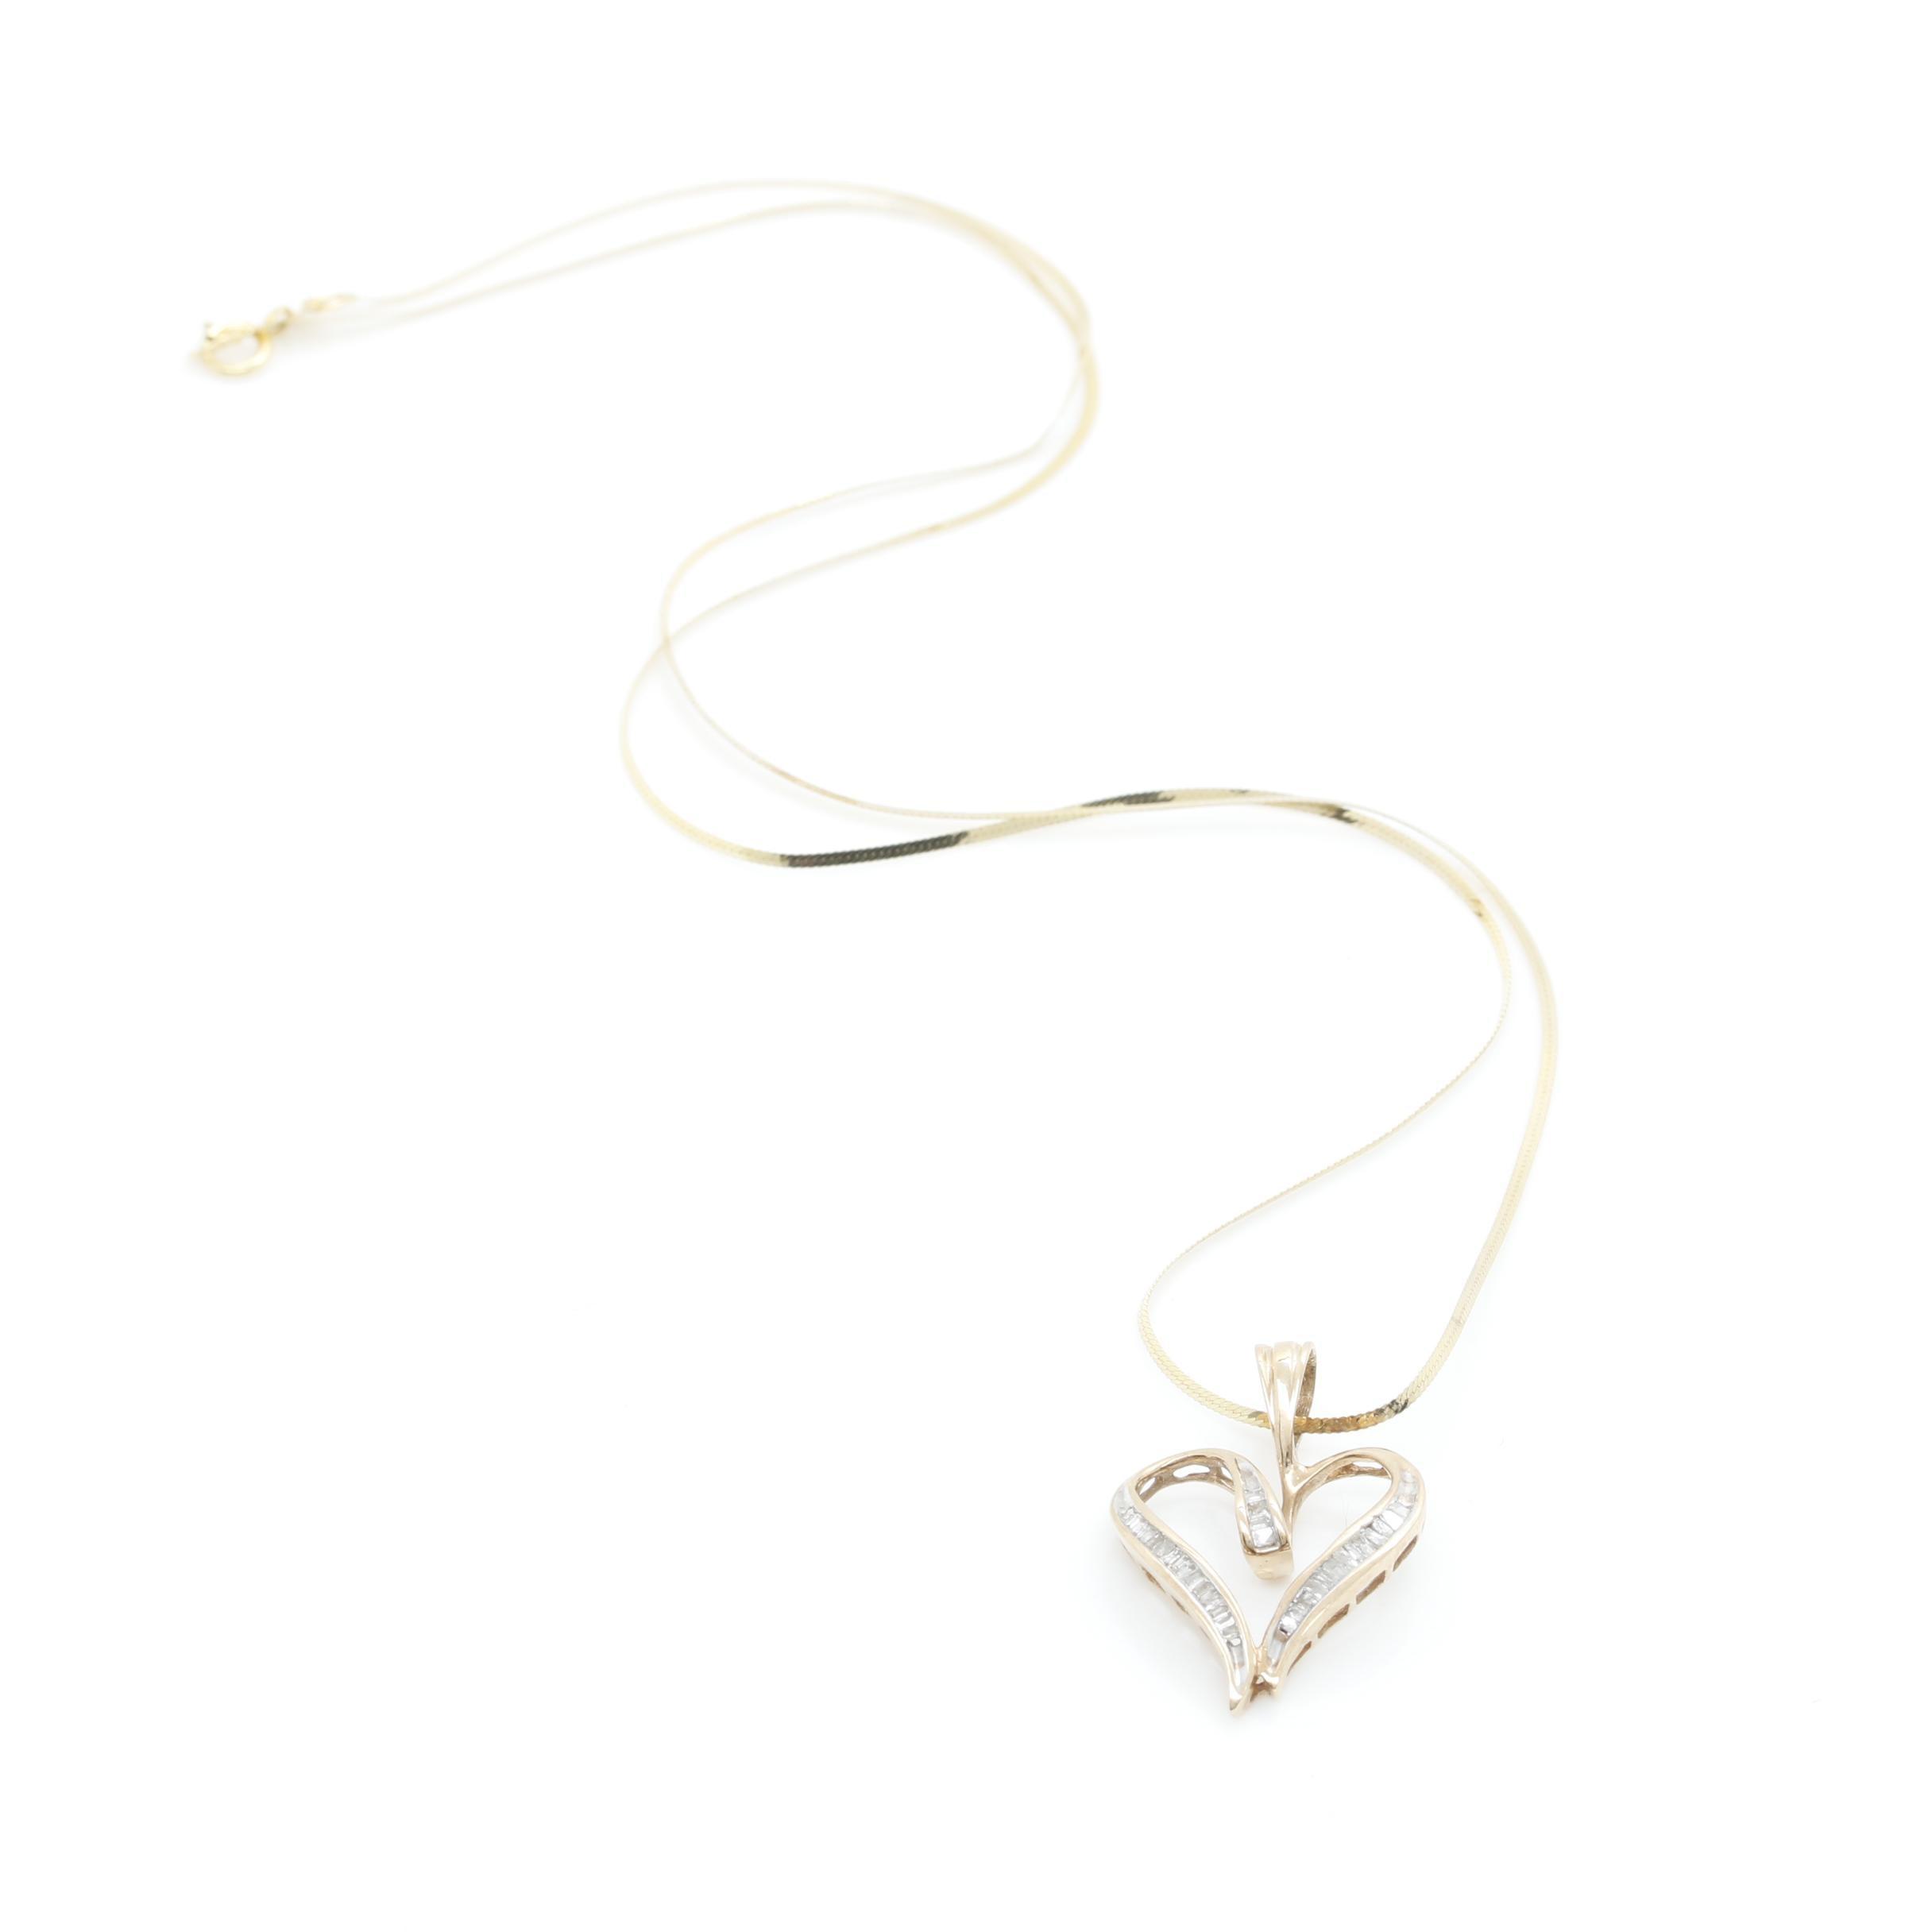 10K Yellow Gold Diamond Heart Shaped Pendant Necklace